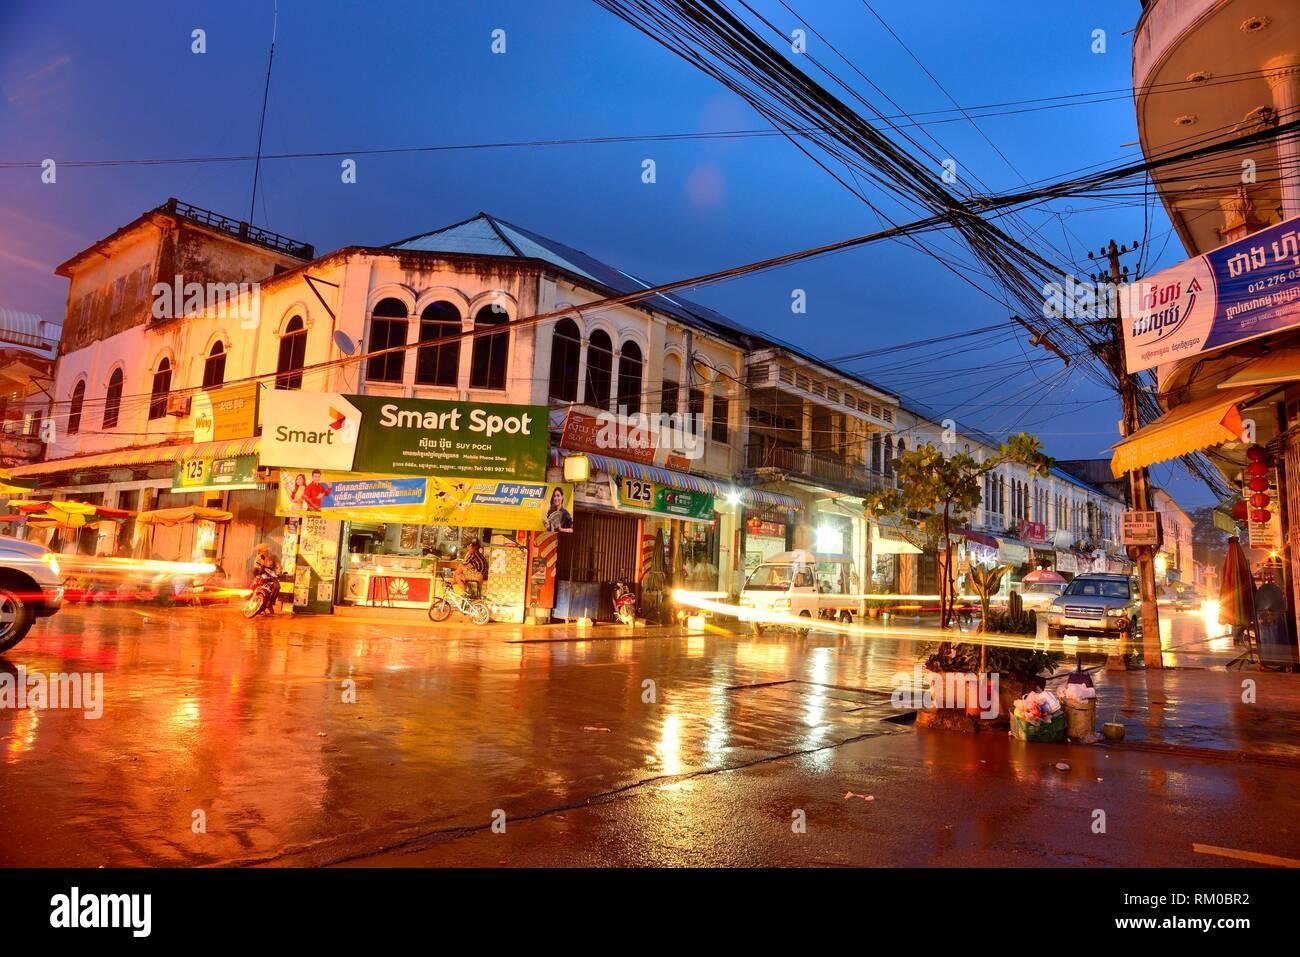 Preah Sihanouk street. Street Market (Psar) of Kratie, Cambodia. Stock Photo